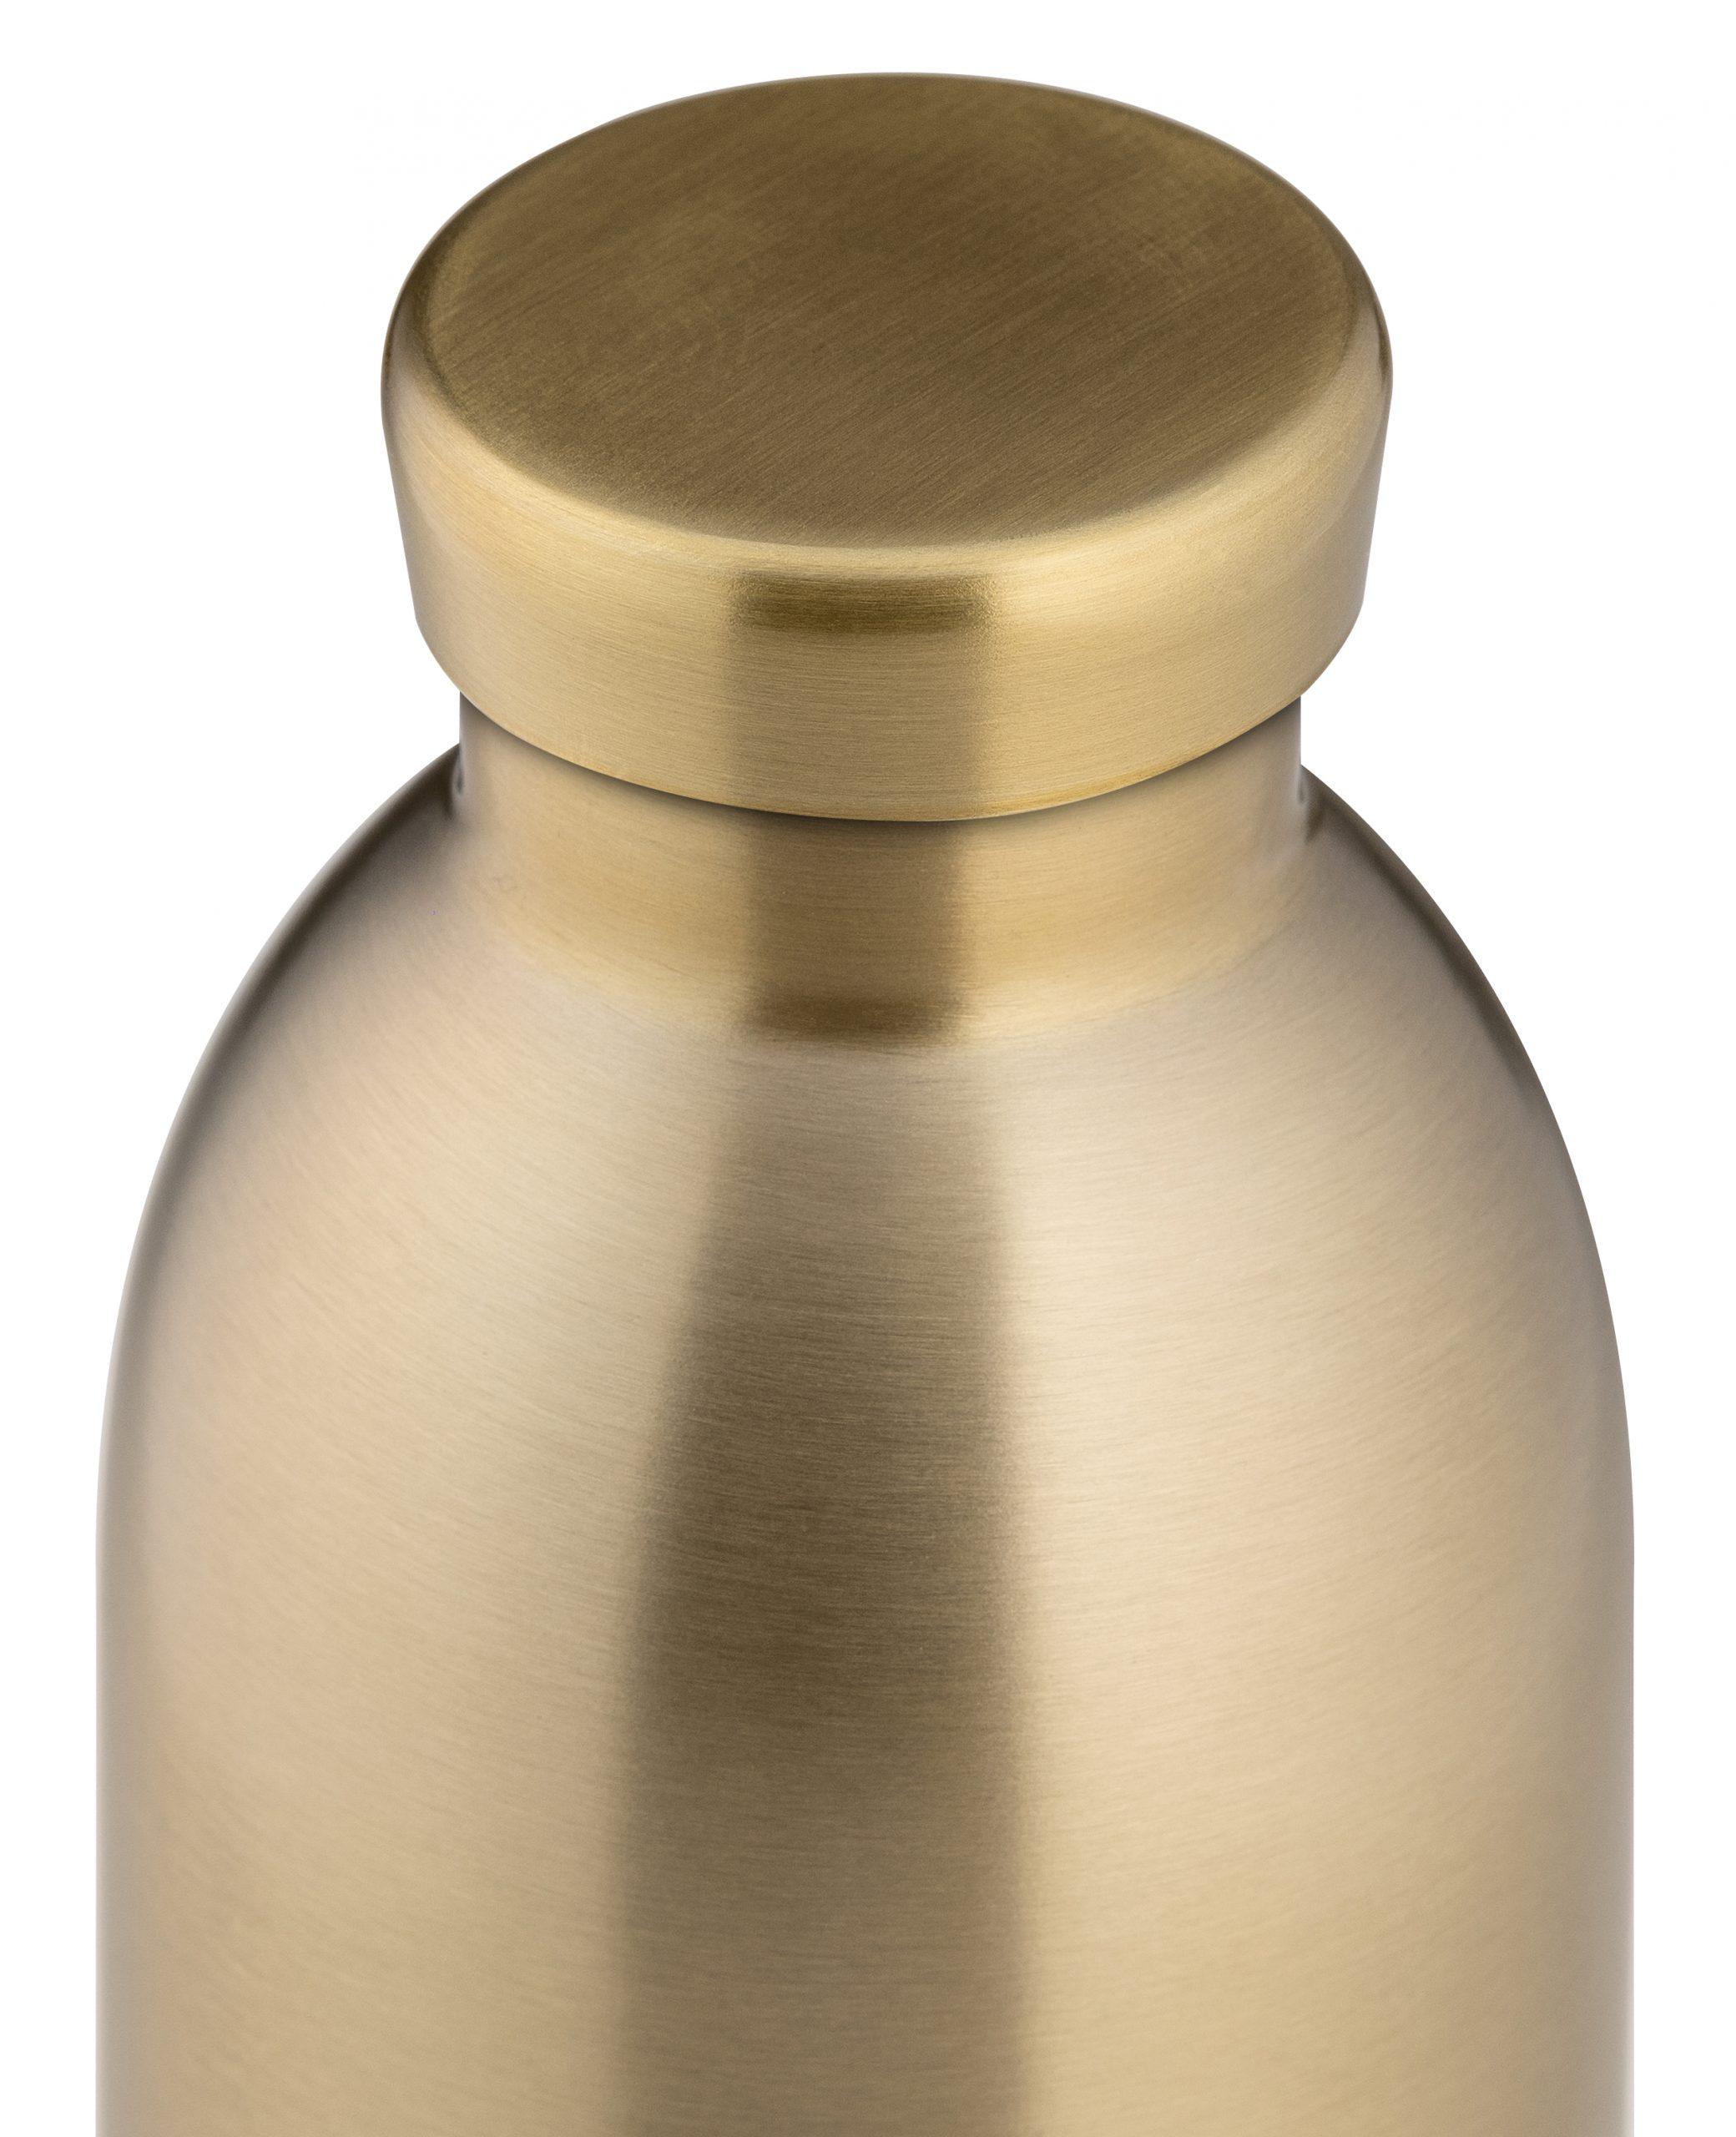 24bottles® Clima Bottle 500ml – Prosecco Gold